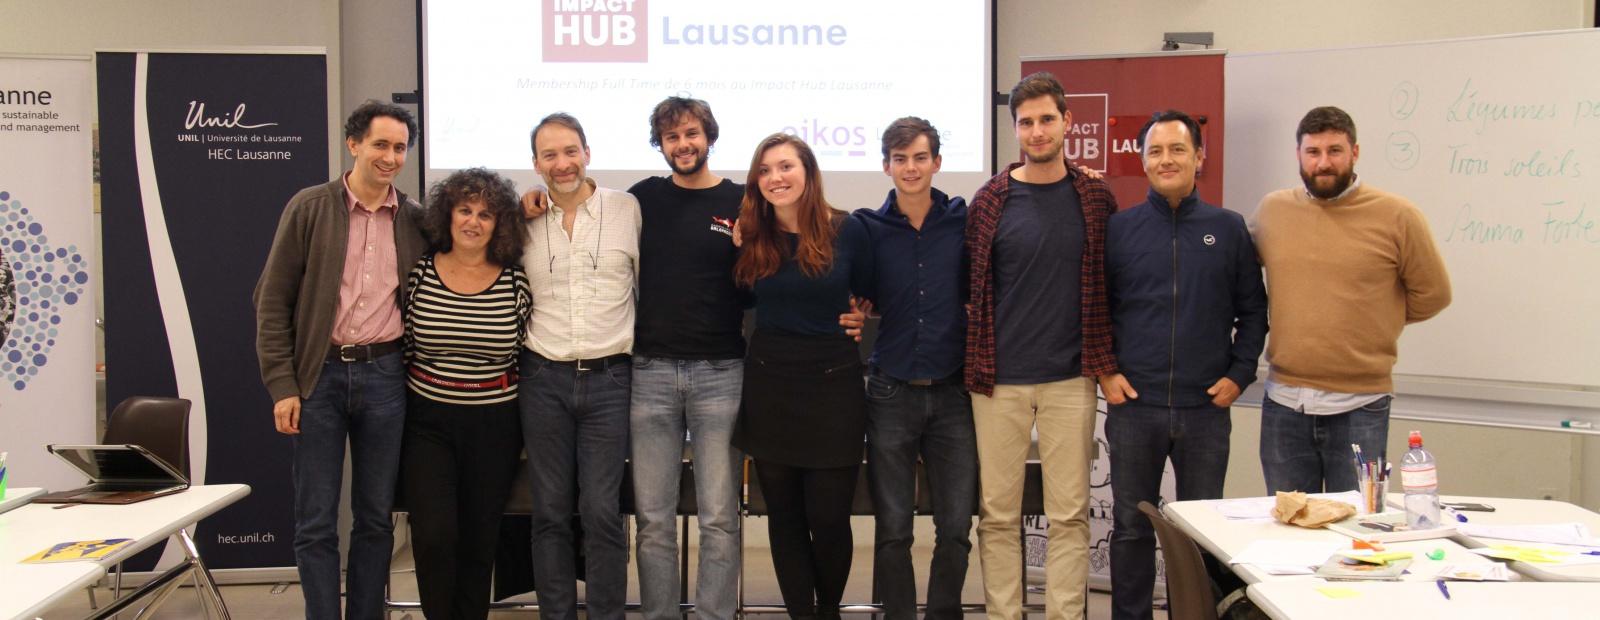 Participants Urban Creathon 2017